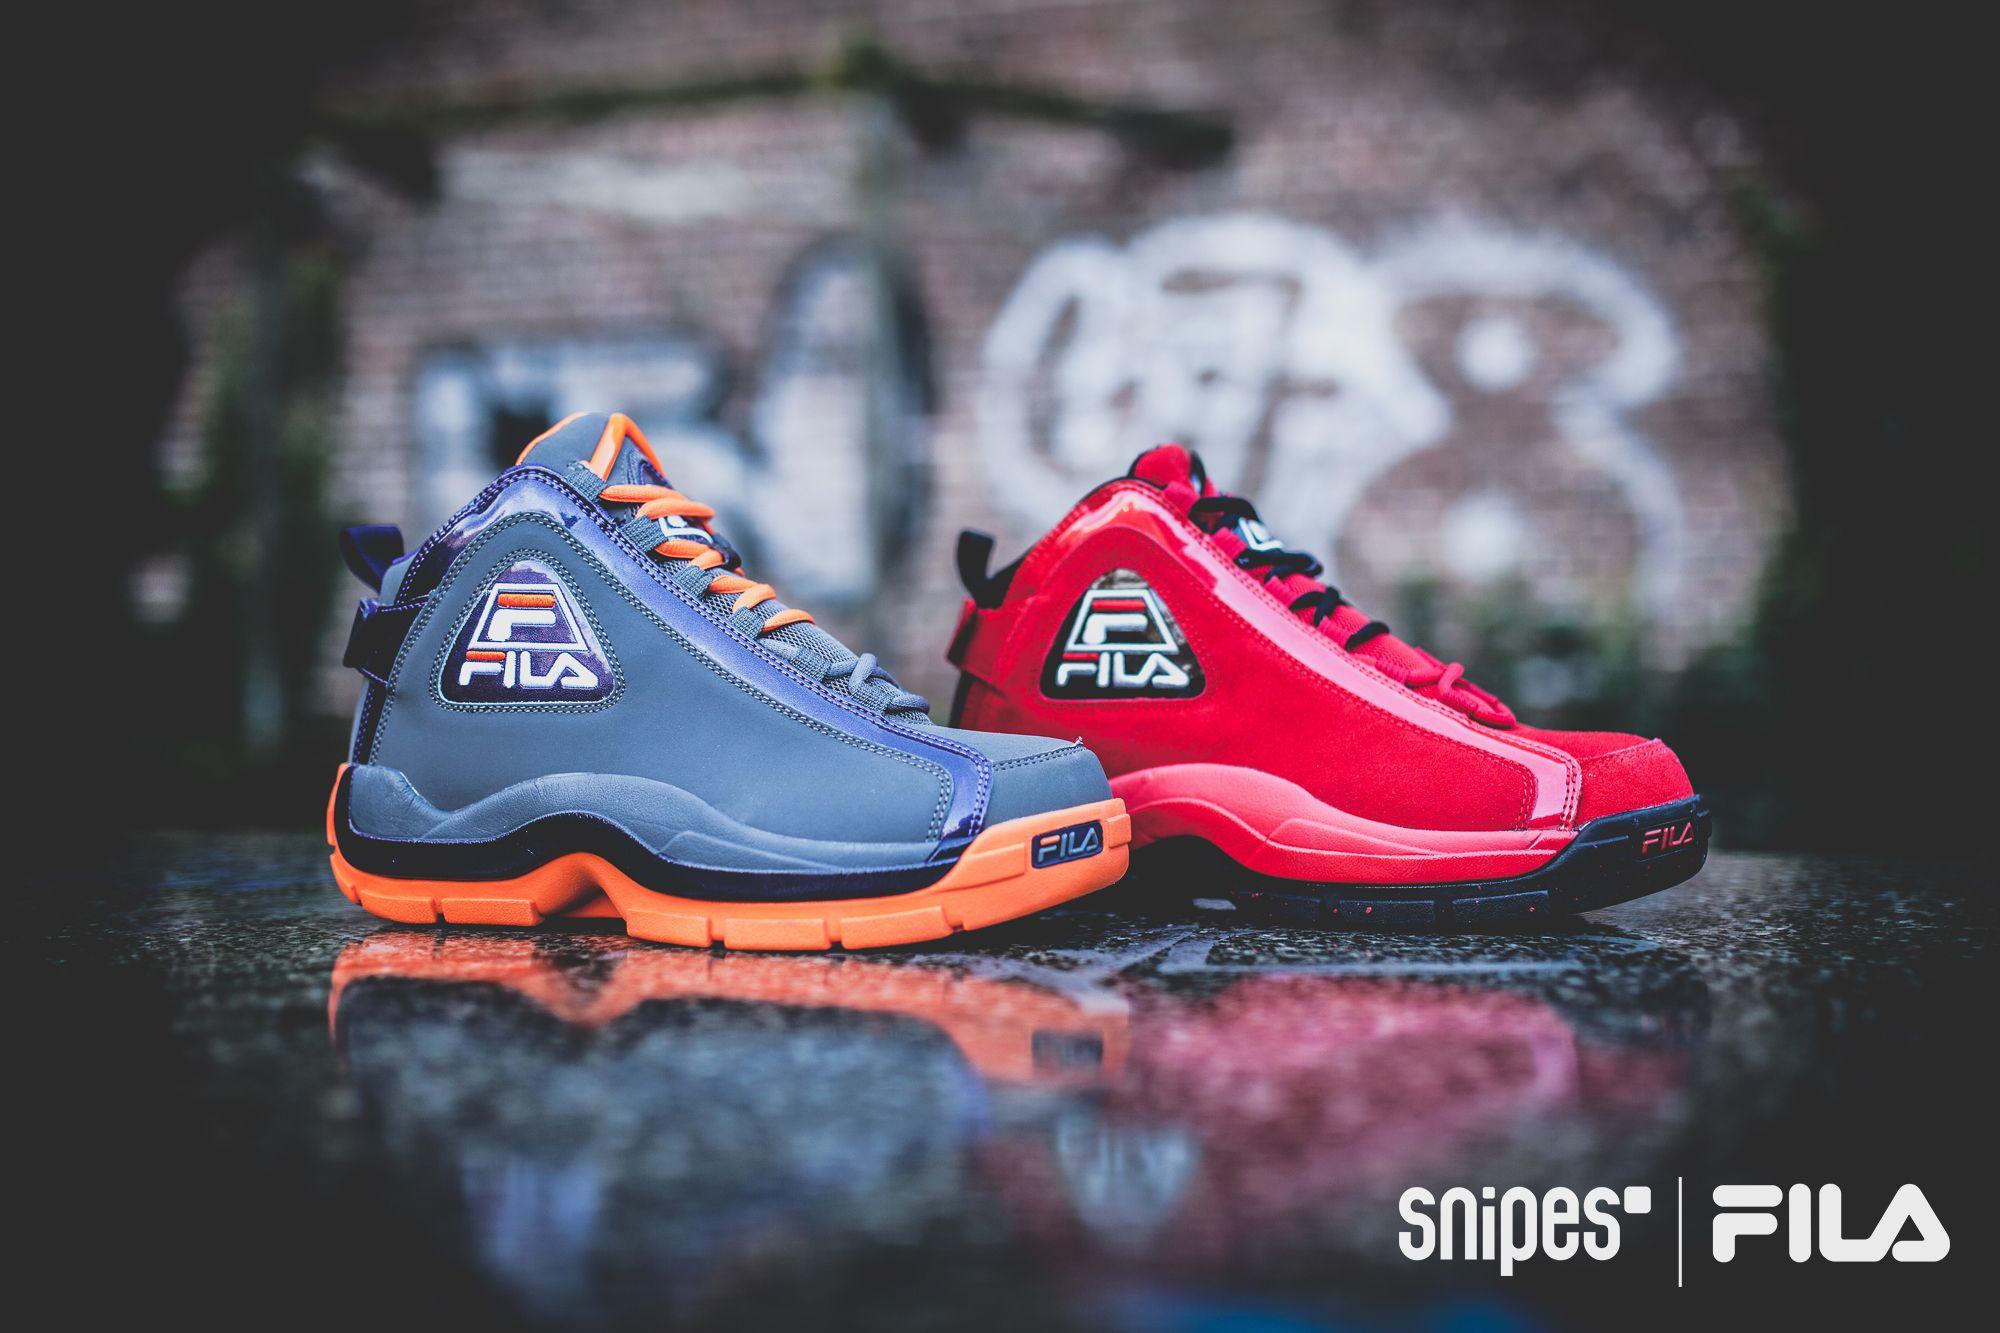 fila 96 sneakers